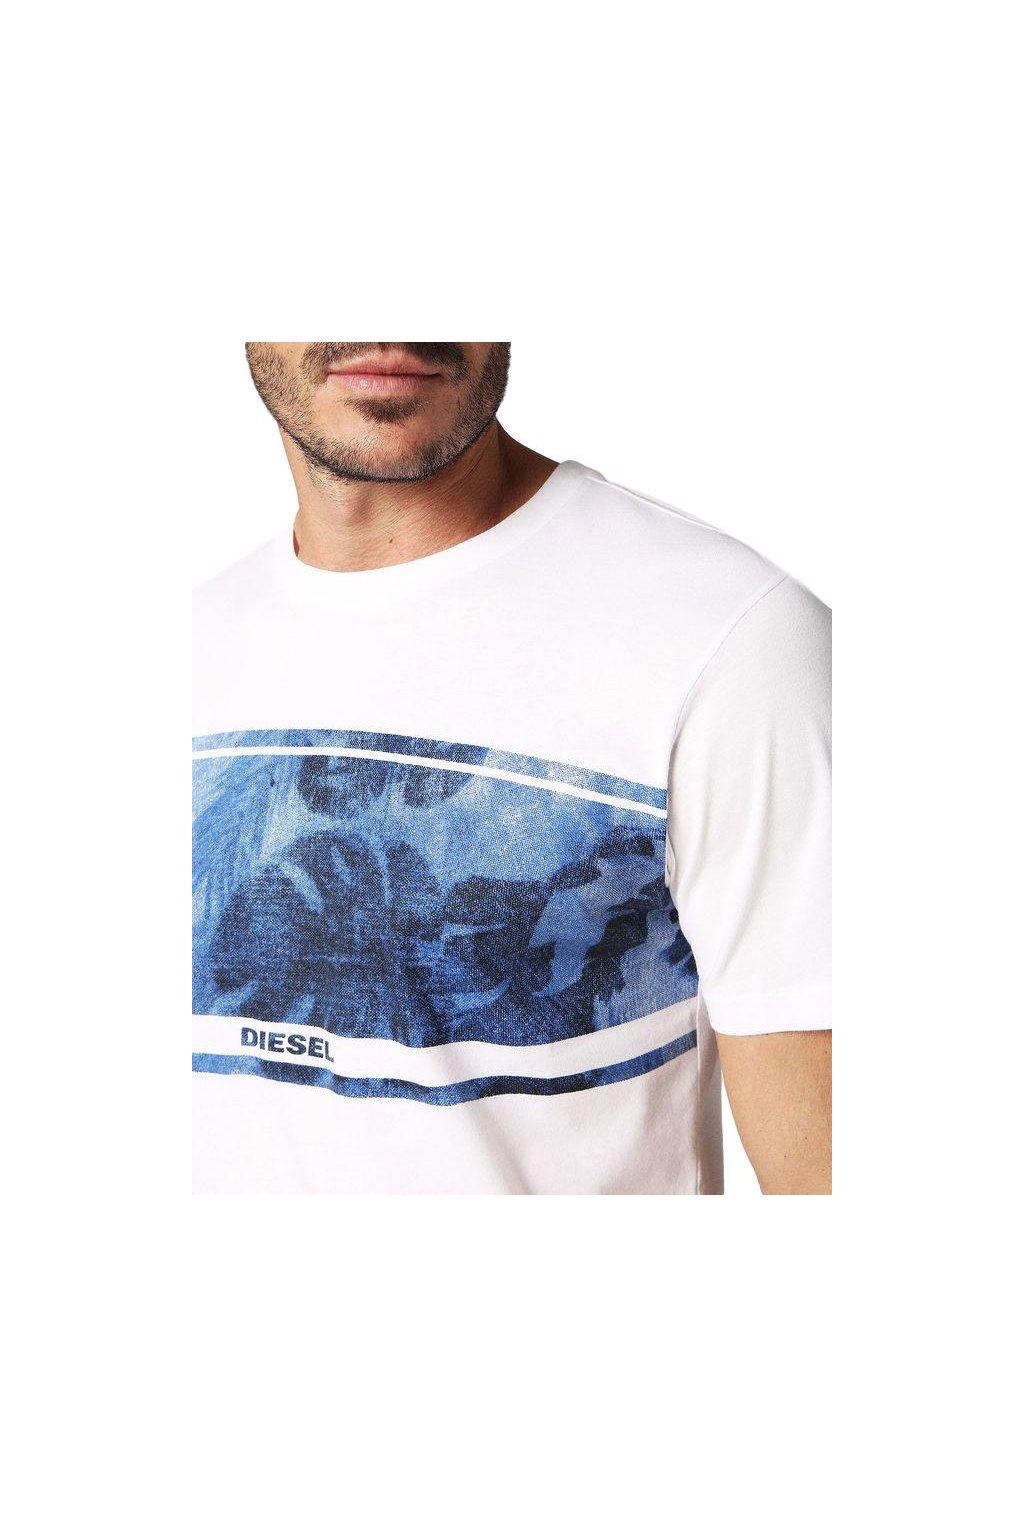 Diesel Logo Tričko - bílé